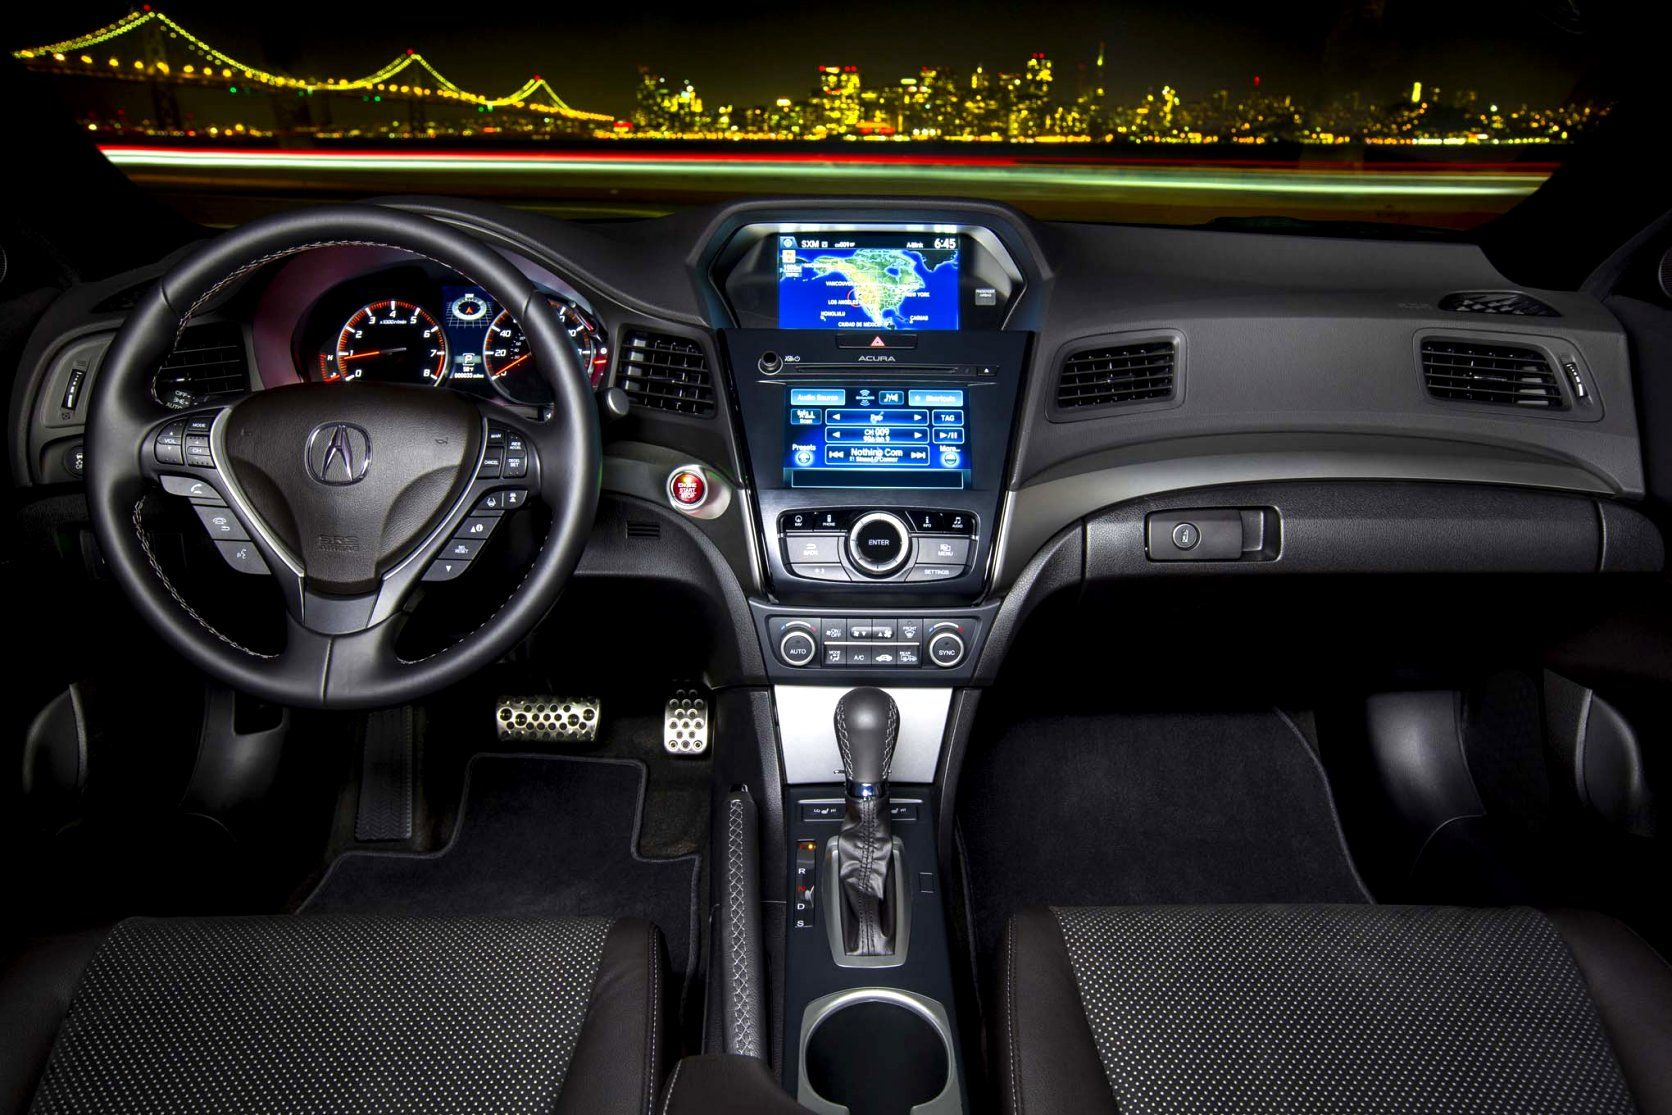 2020 Acura Ilx Interior New Review